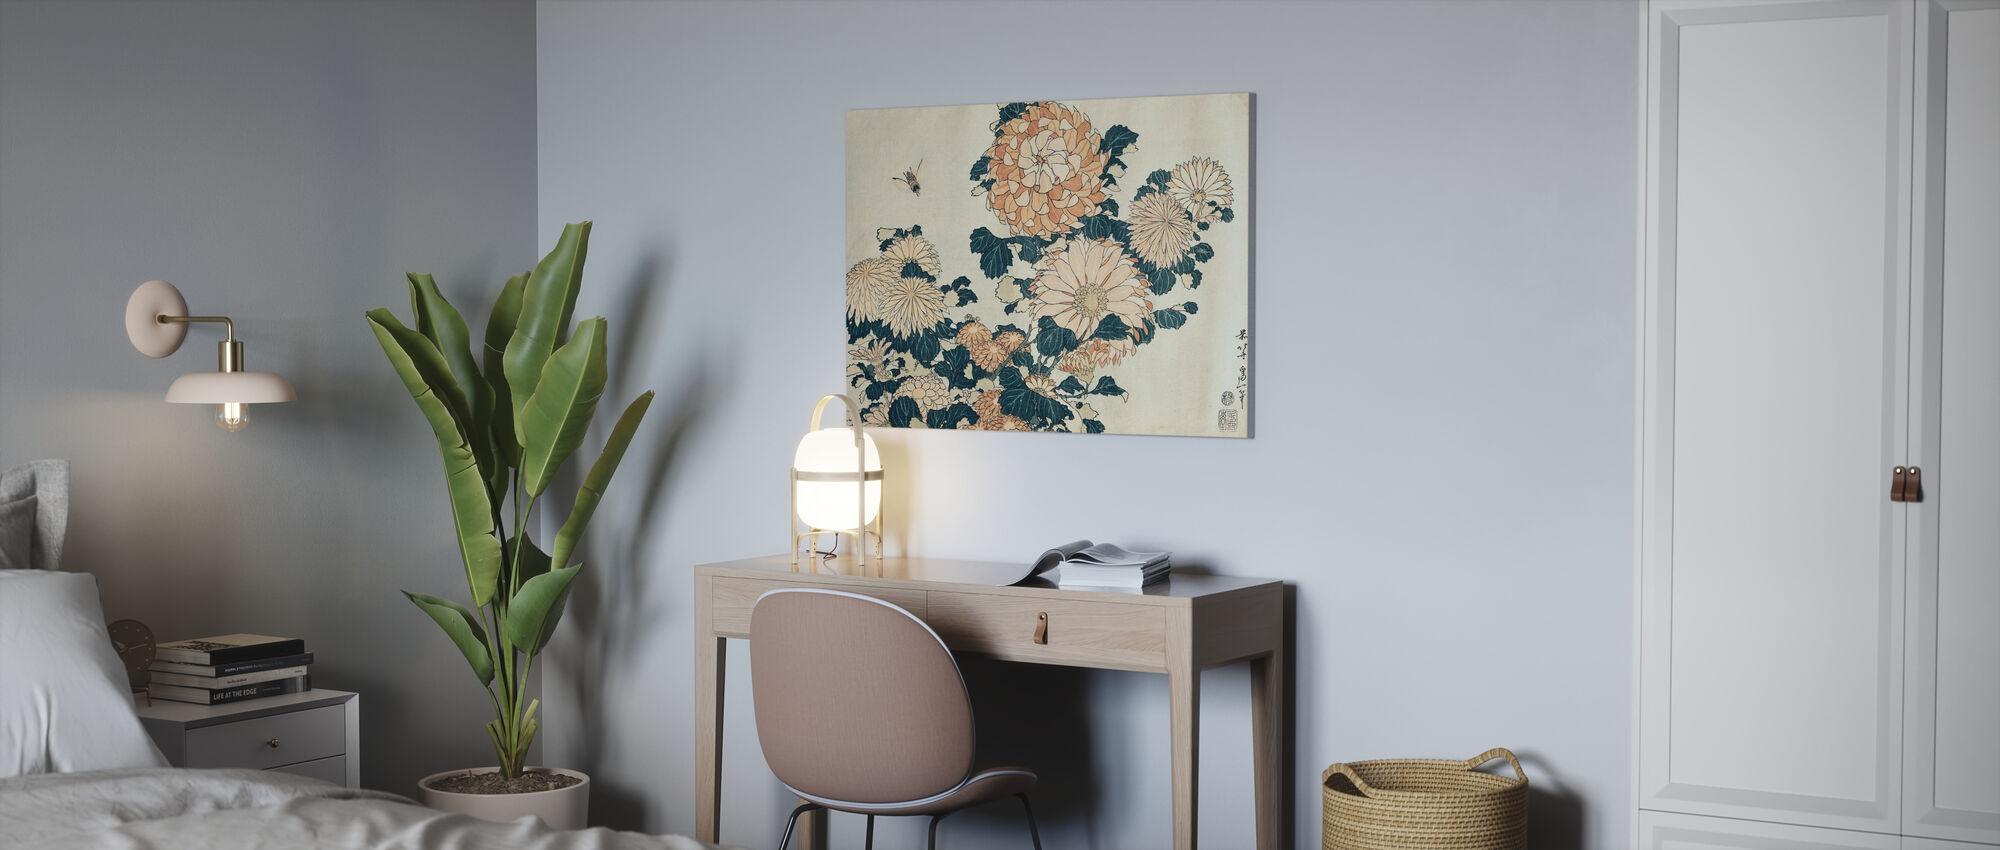 Chrysanthemums, Katsushika Hokusai - Canvas print - Office